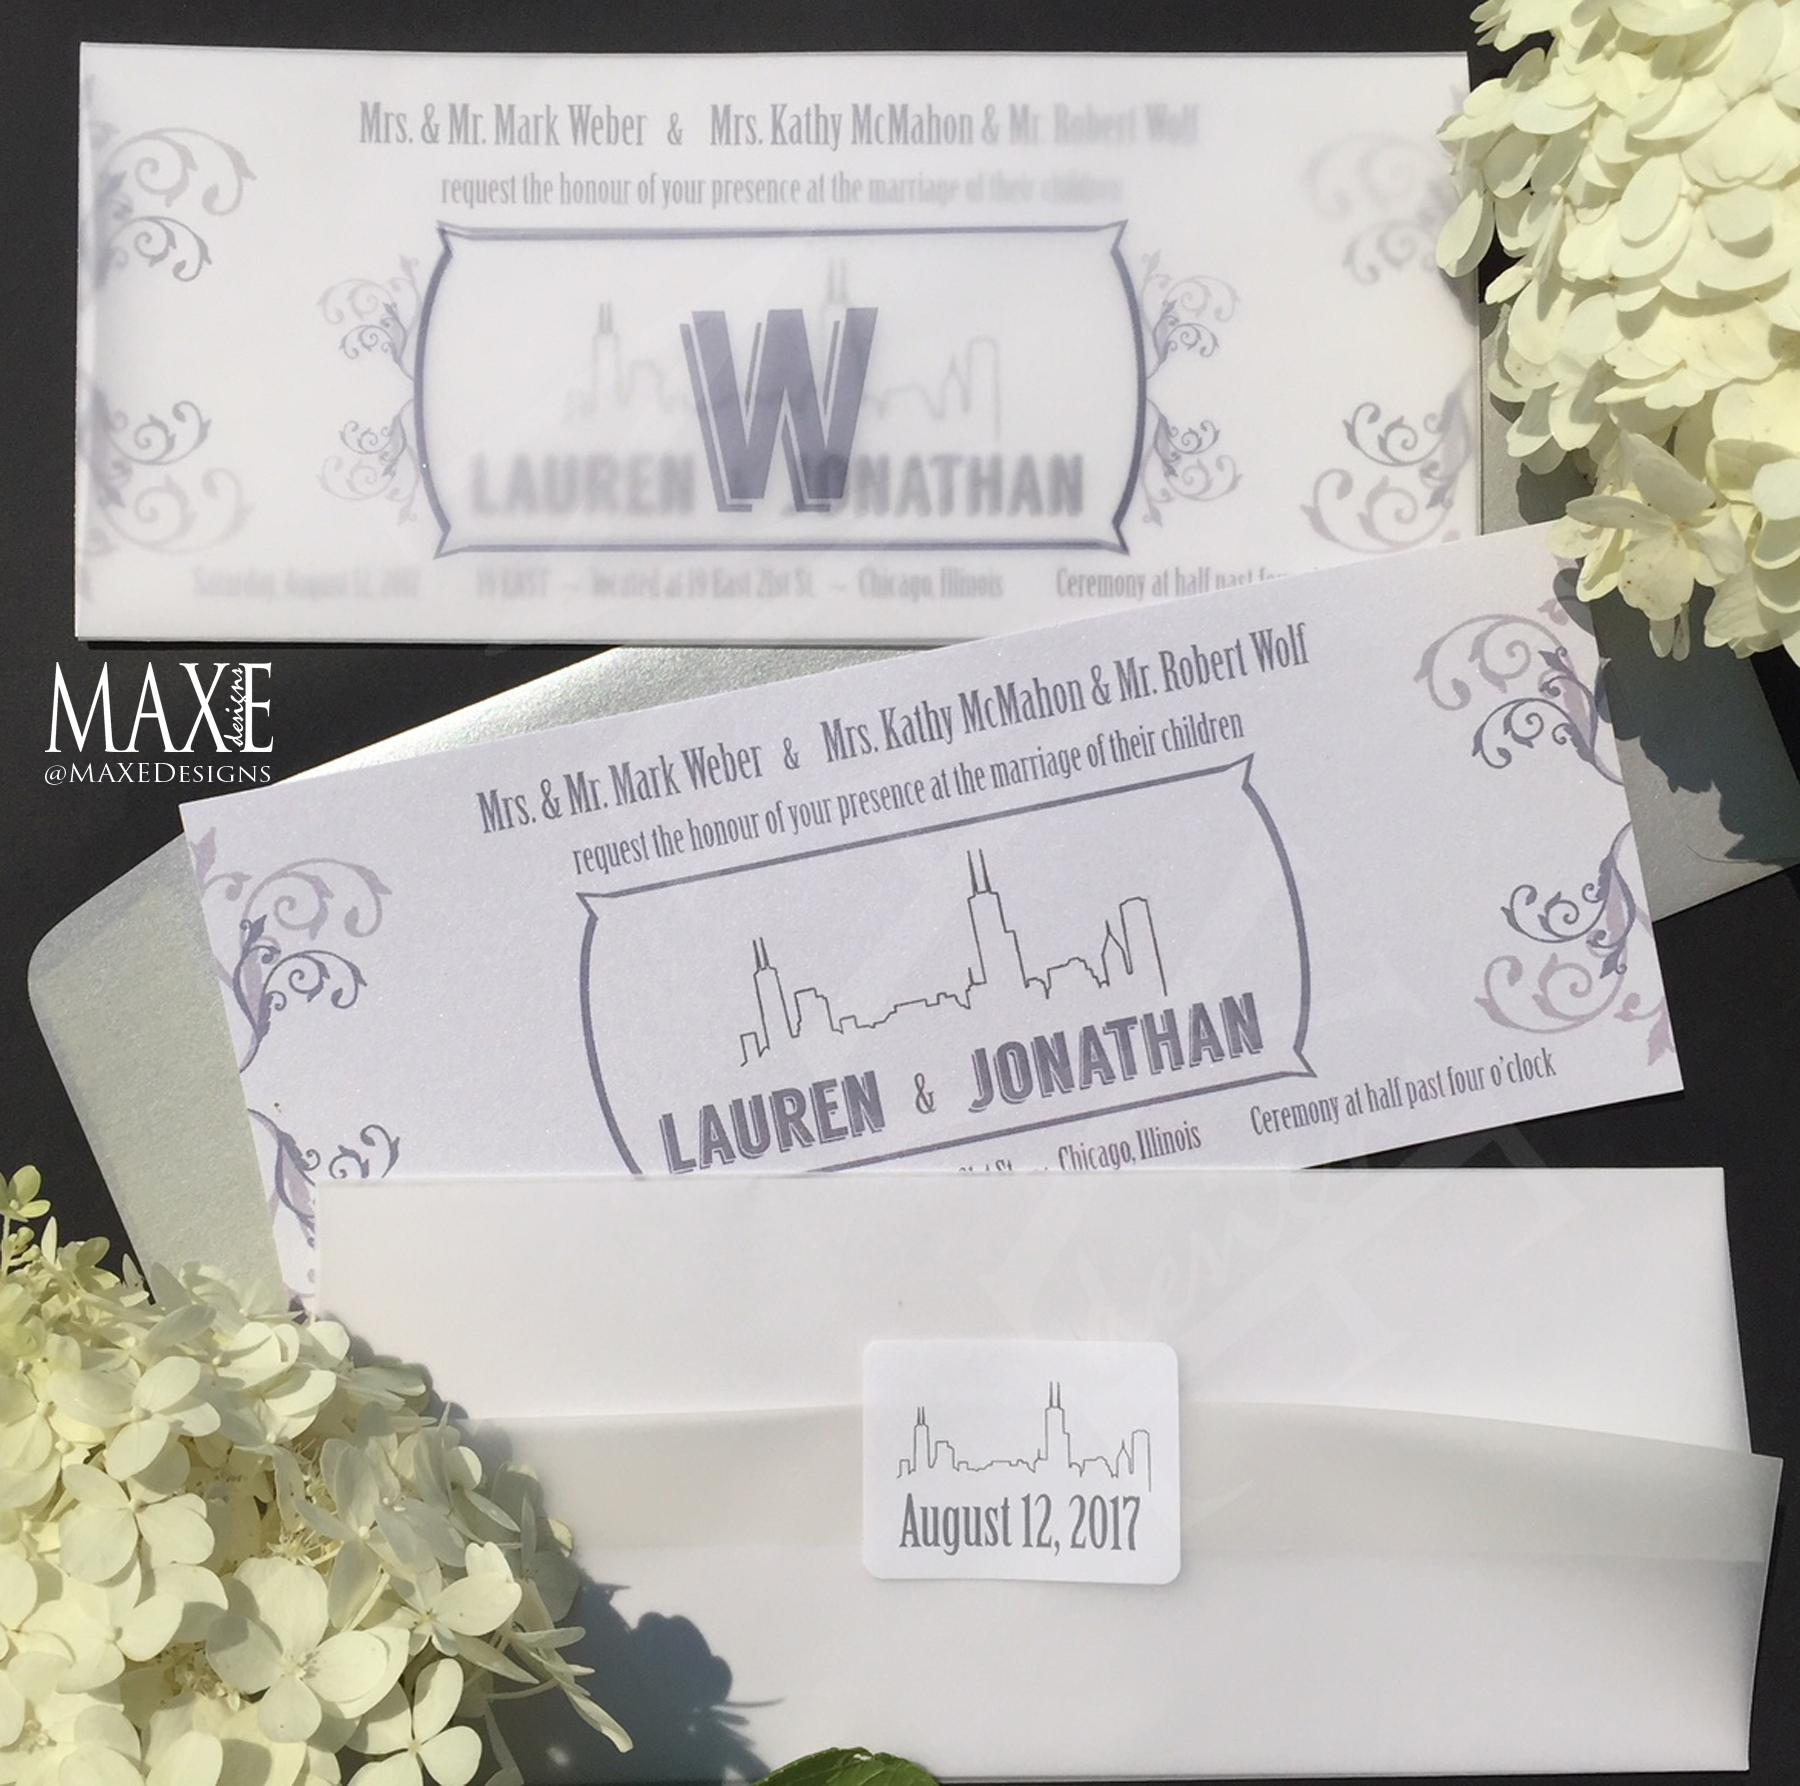 Lauren & Jon MAXE Designs.jpg